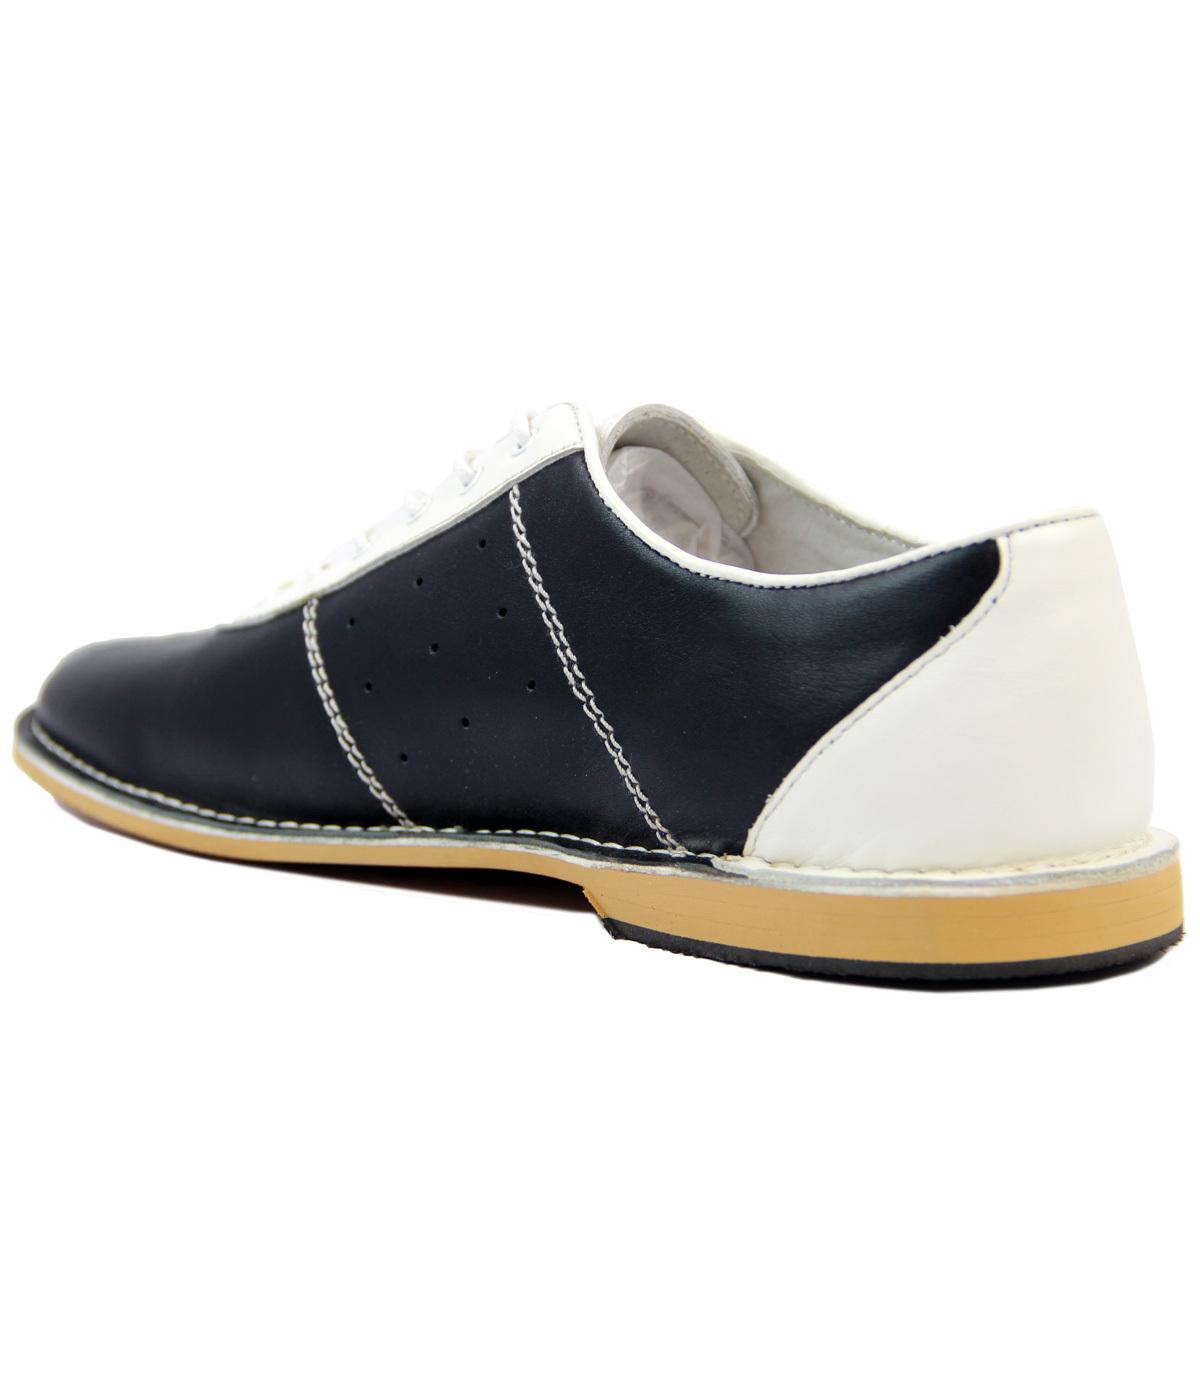 62cfcf6d984a5 MADCAP ENGLAND All Up Retro 60s Mod Bowling Shoes Red/Blue